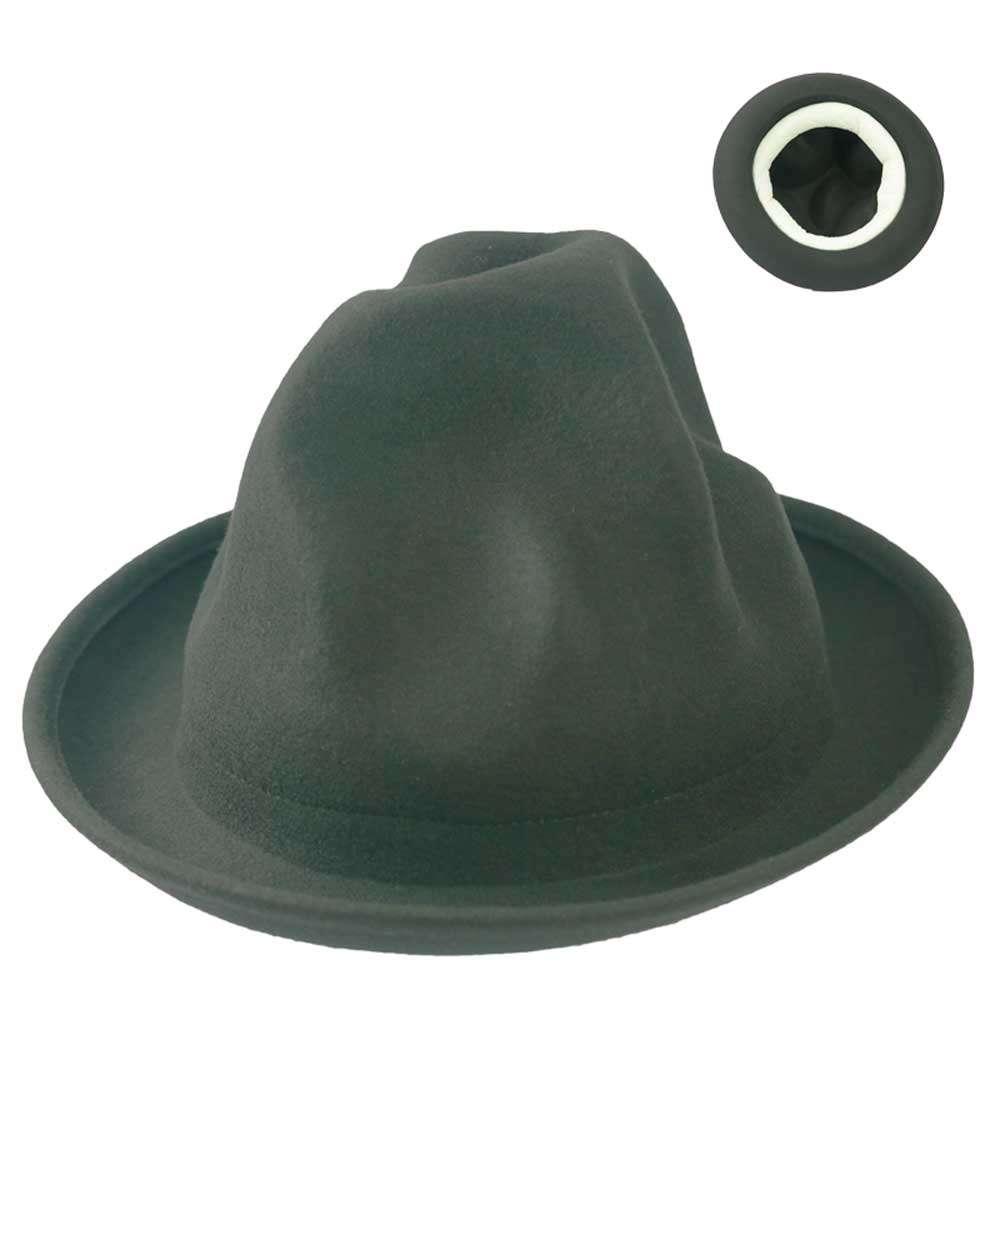 Oversized Mountain Hat Odd Shaped- Black